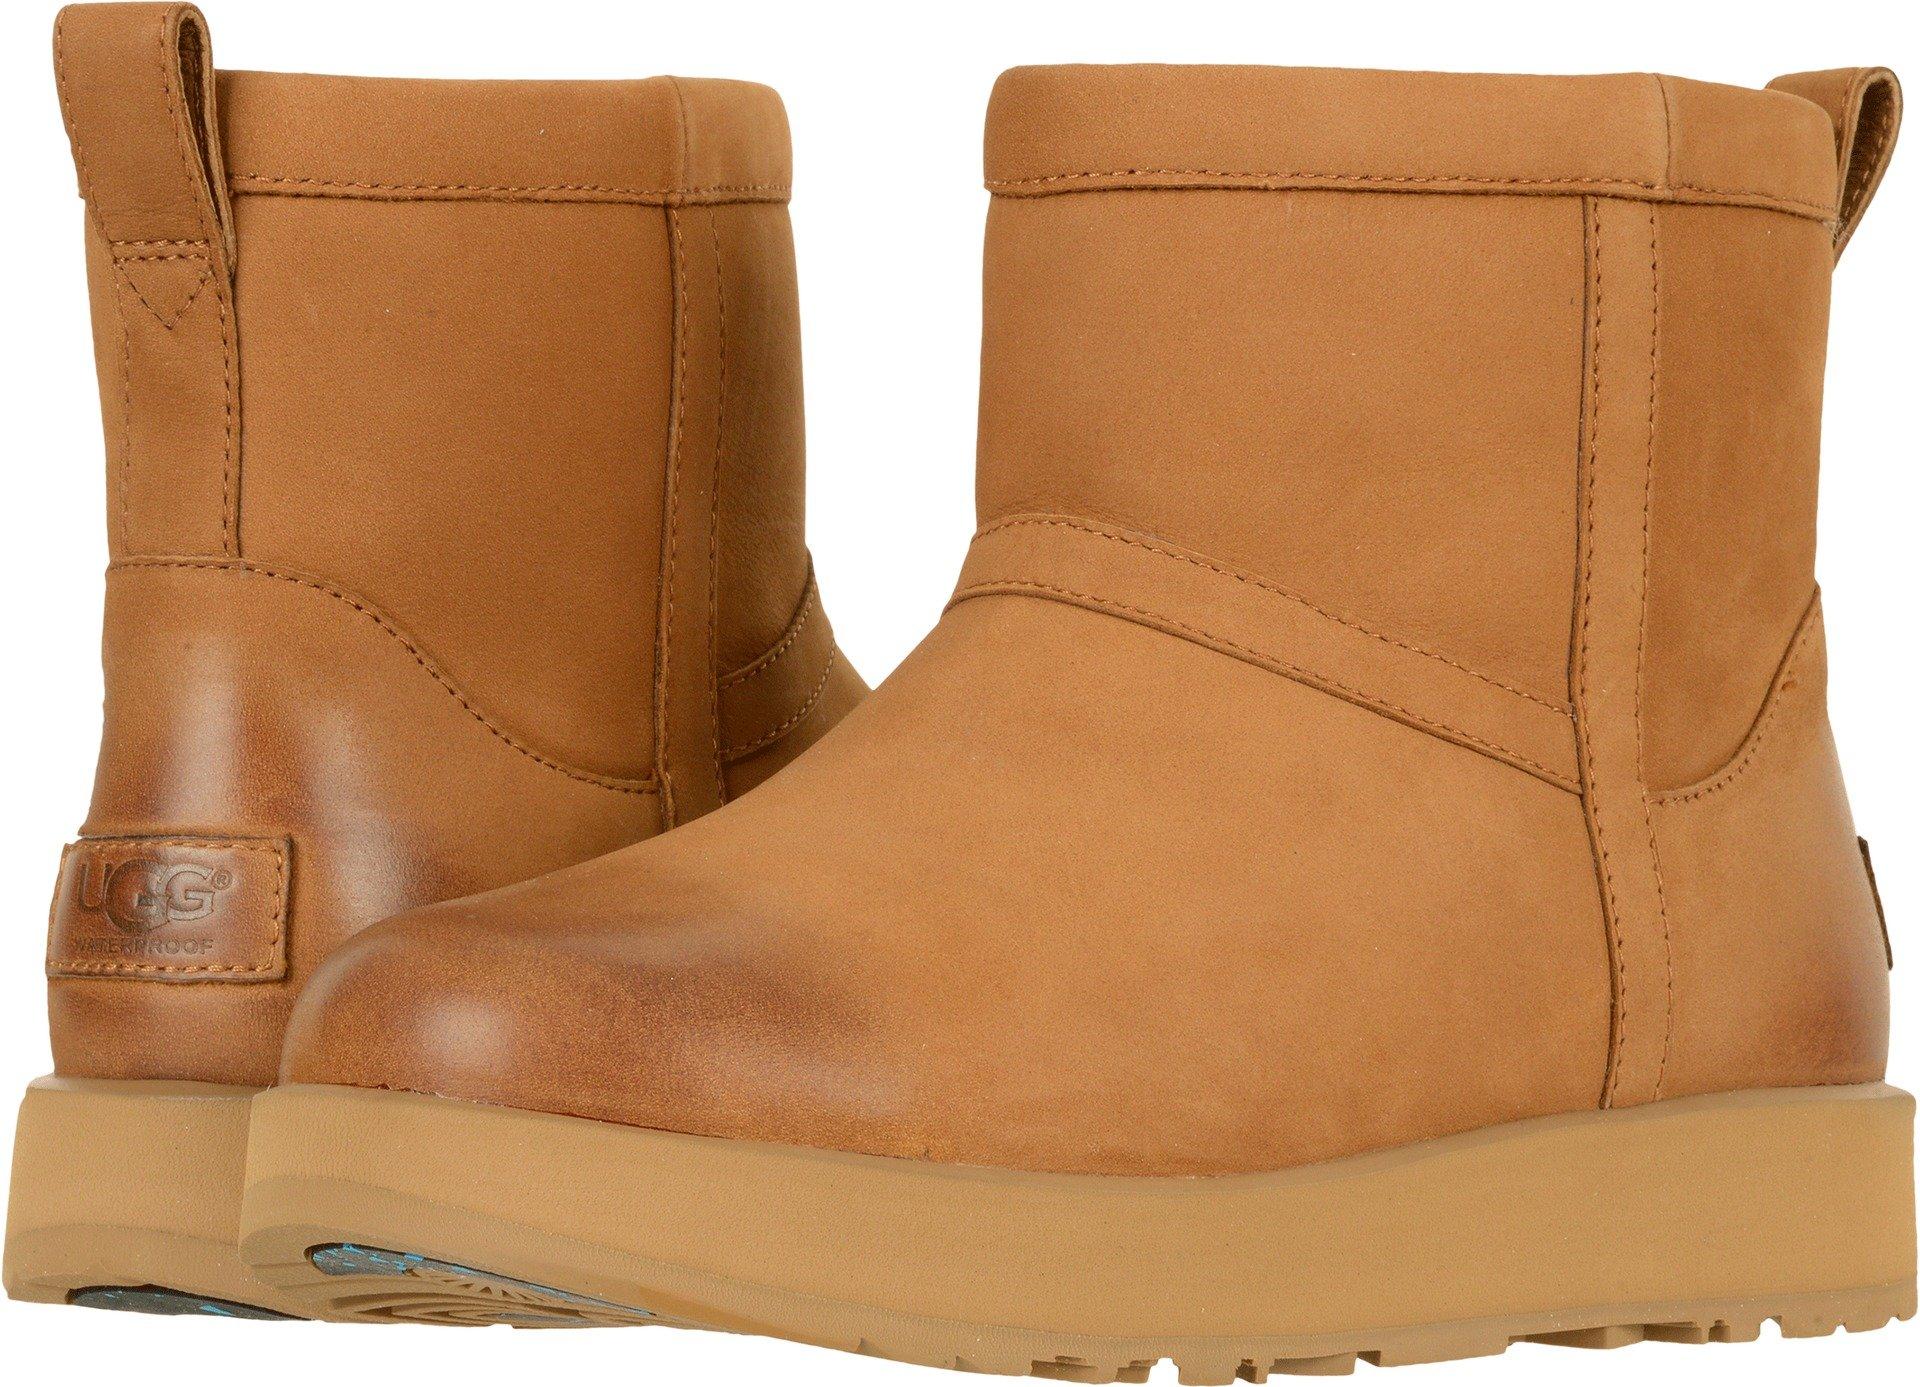 UGG Womens Classic Mini L Waterproof Rain Boot Chestnut Size 9